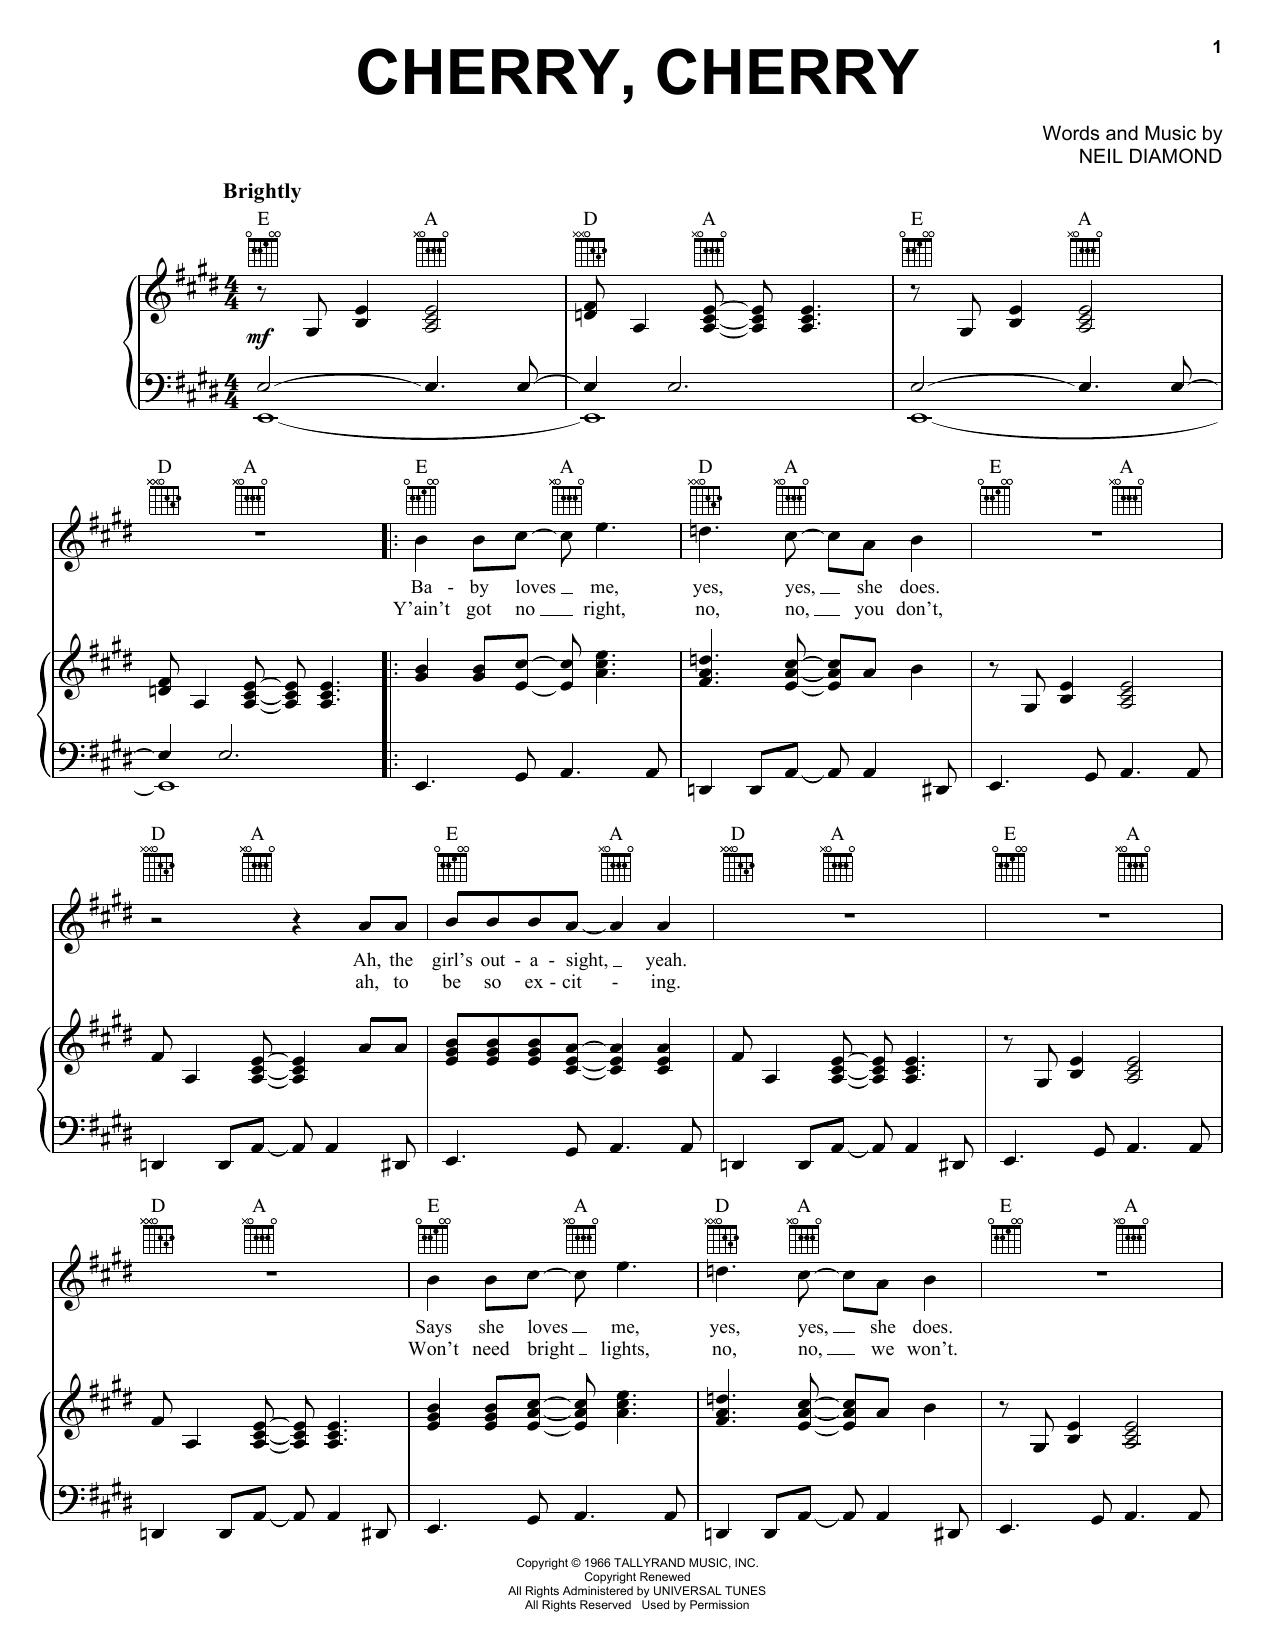 Neil Diamond Cherry, Cherry sheet music notes and chords